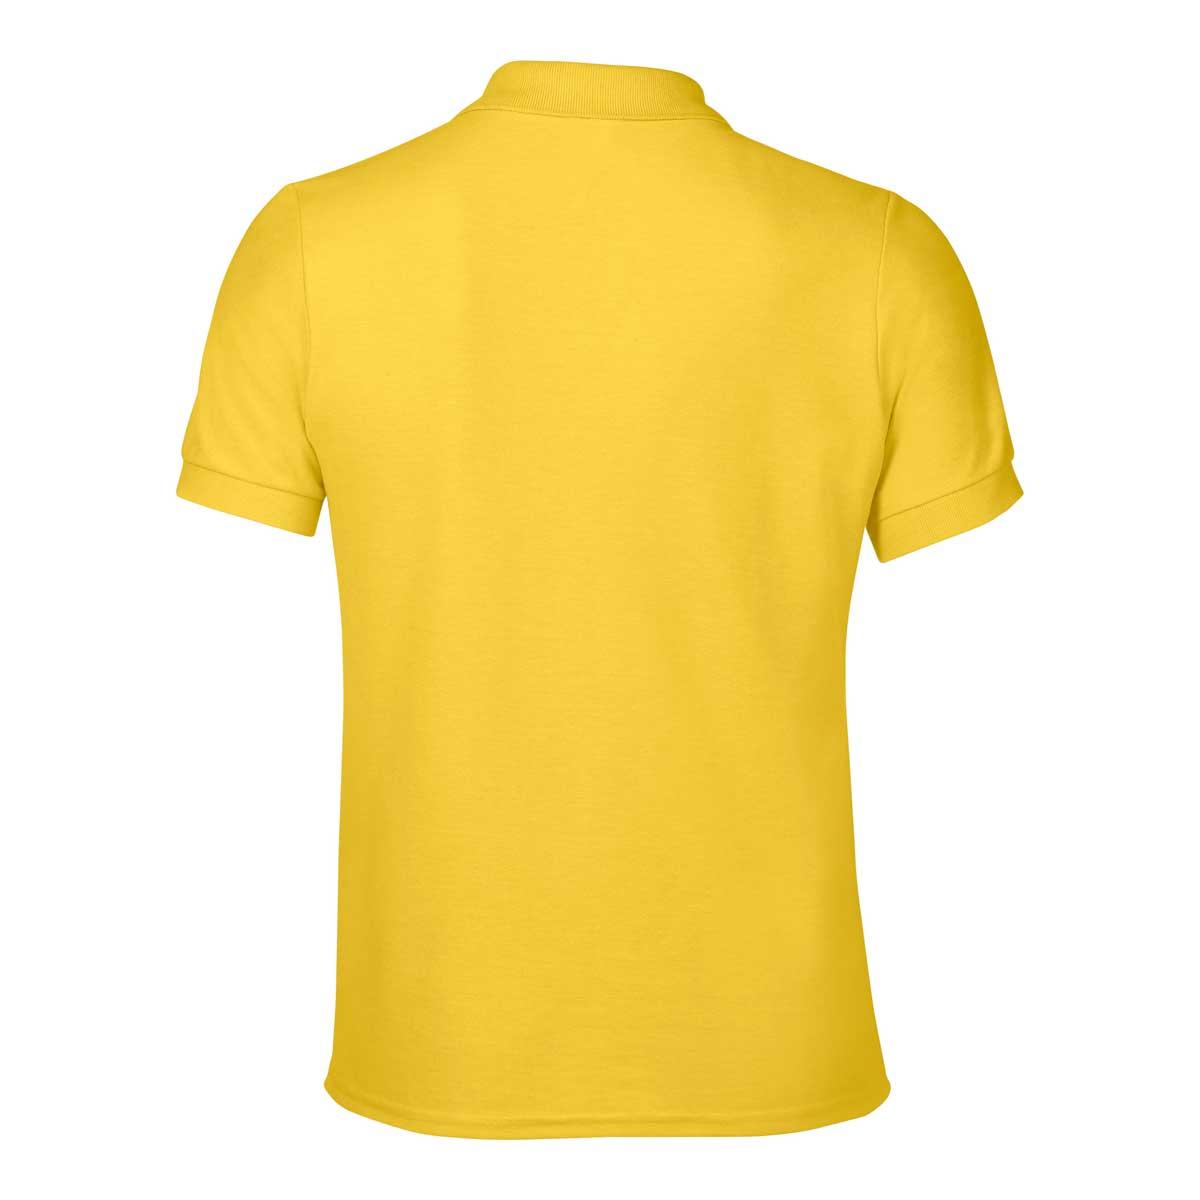 05_ba301_jaune_fonce--0-0--21211a4f-69f3-4e47-ad4f-fcae6b6c3888